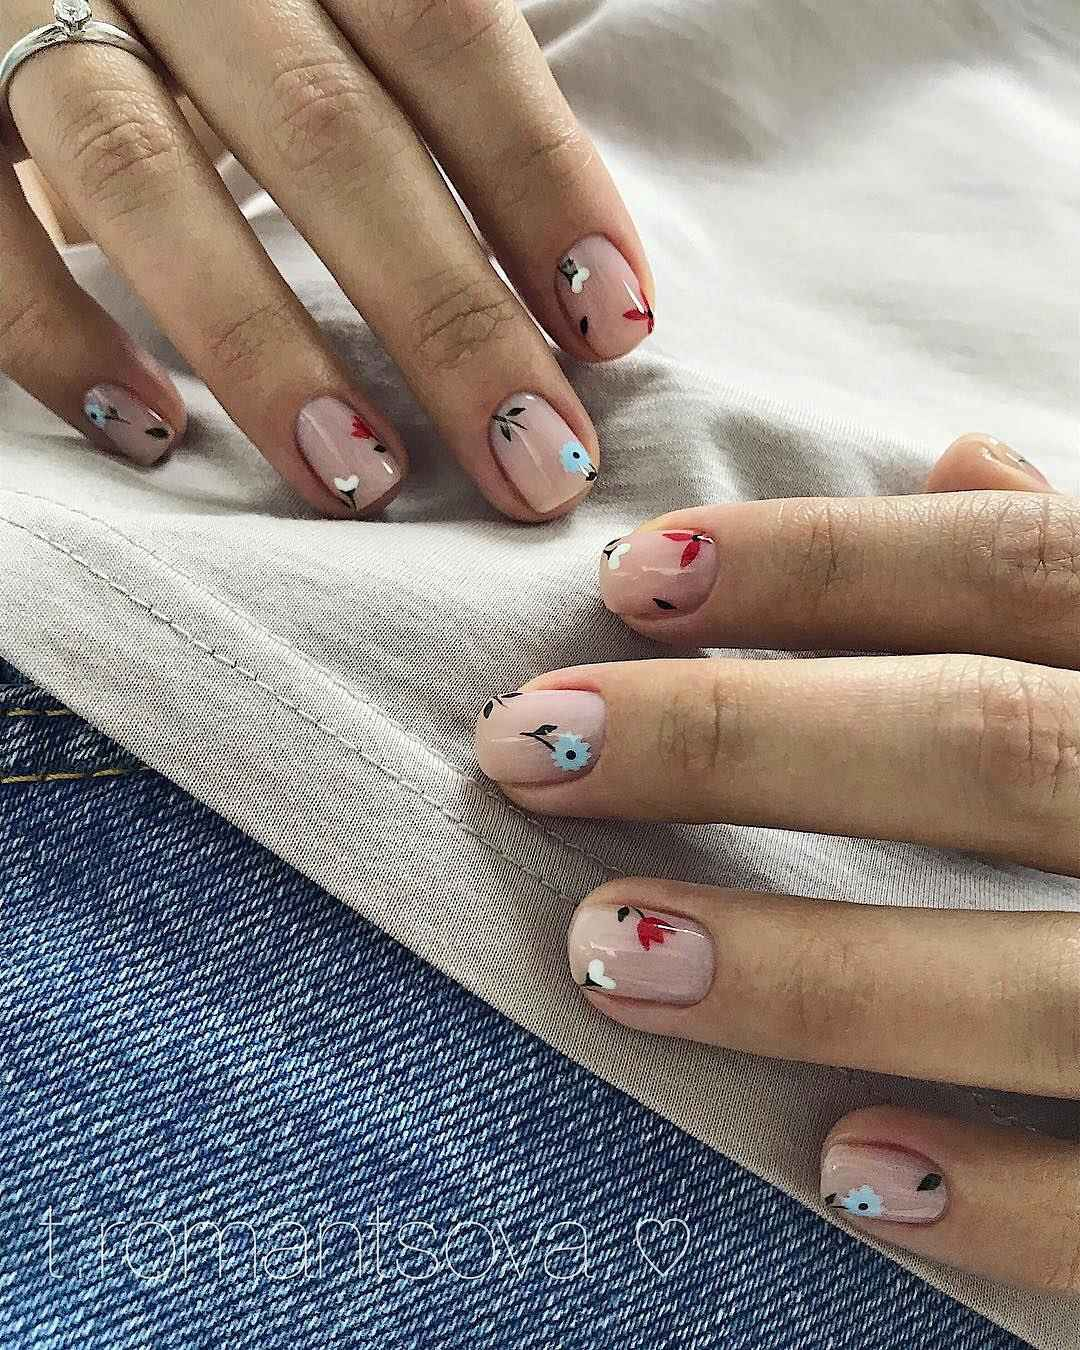 Тренды маникюра на короткие ногти весна 2019 фото_13